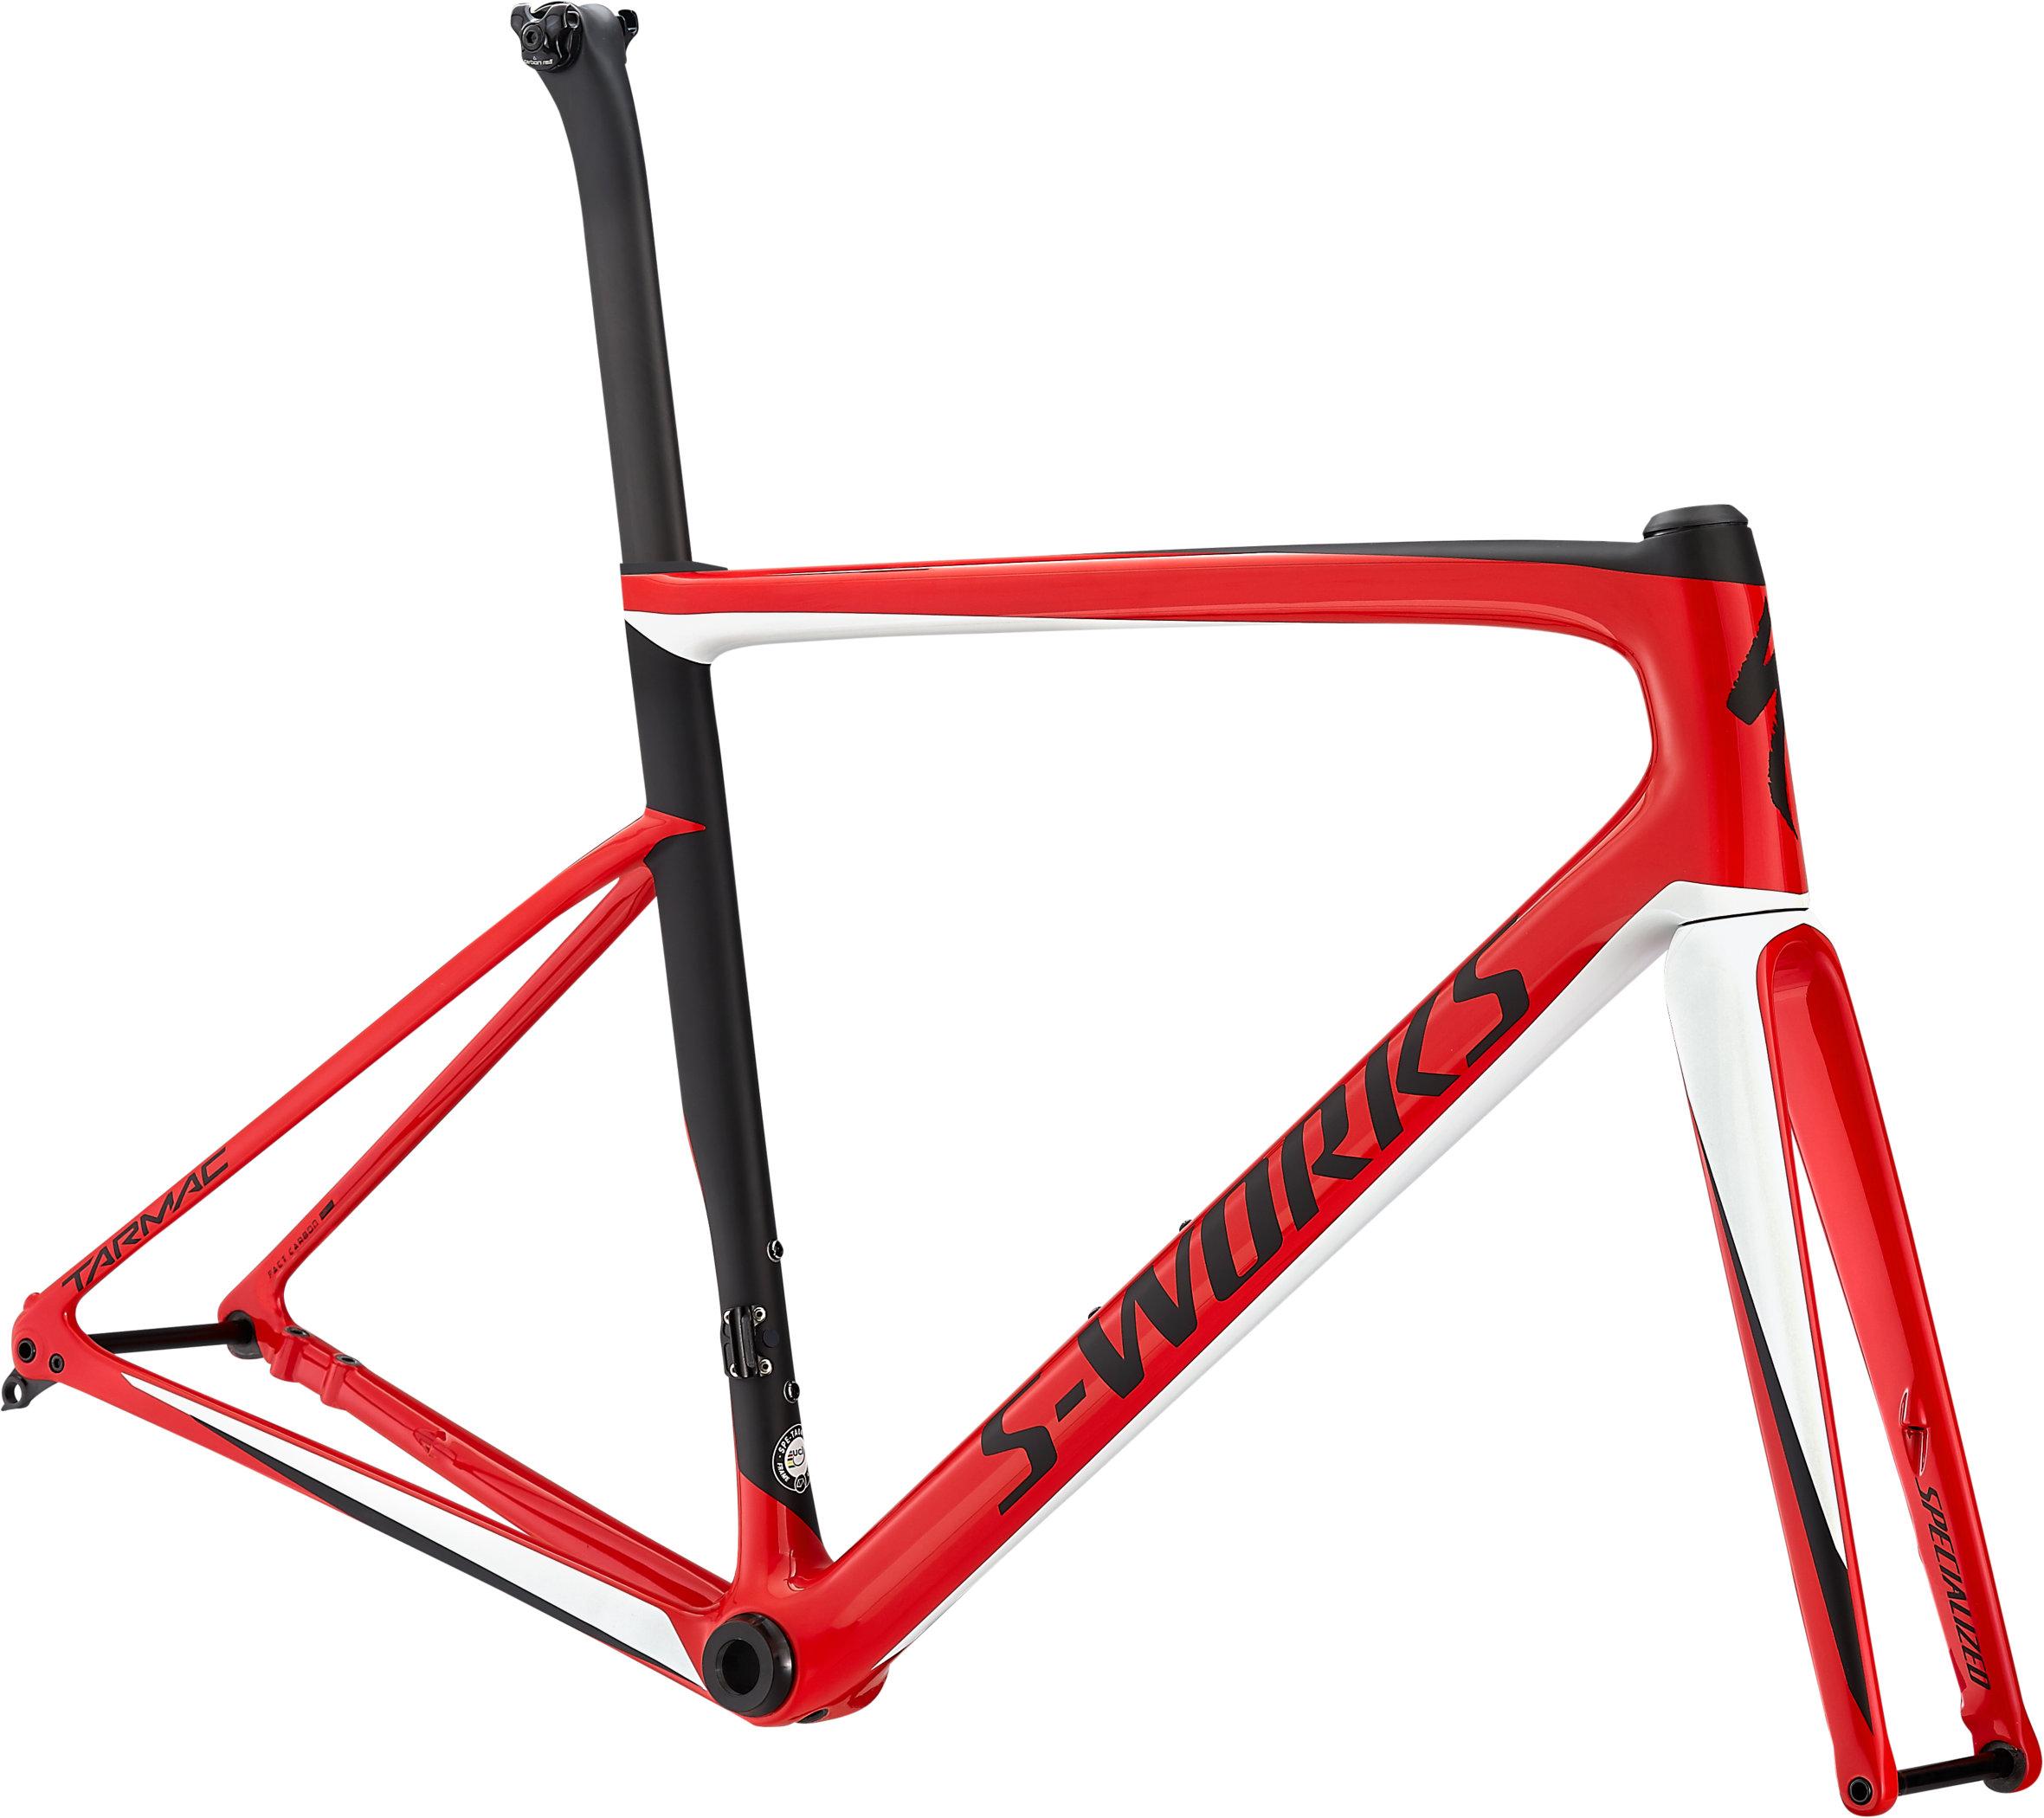 Specialized S-Works Tarmac Disc Frameset GLOSS FLO RED / METALLIC WHITE SILVER / SATIN BLACK 56 - Fahrrad online kaufen | Online Shop Bike Profis